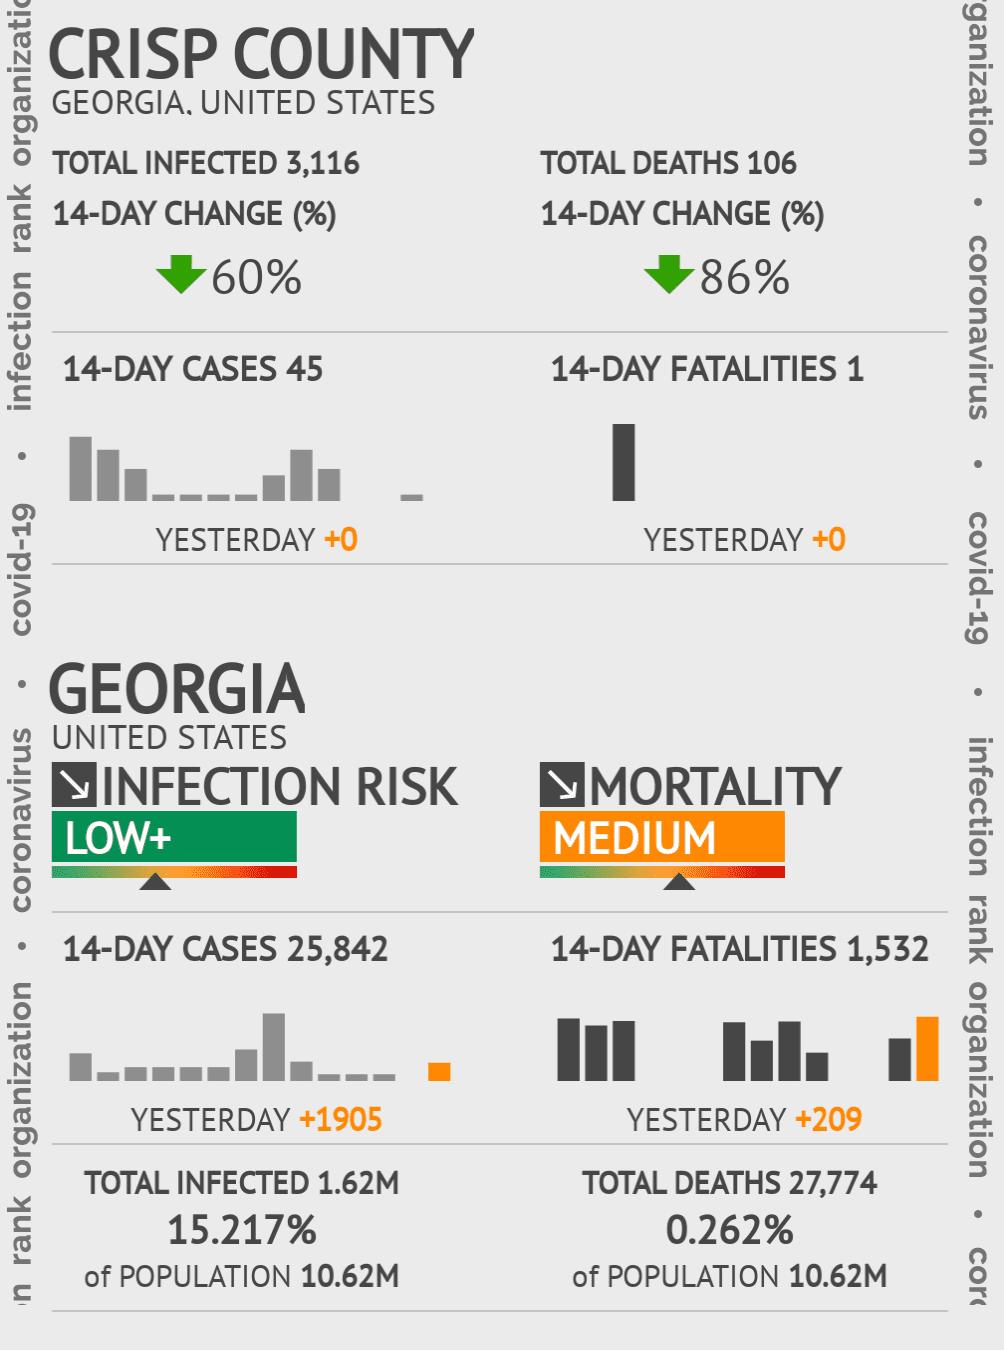 Crisp County Coronavirus Covid-19 Risk of Infection on January 21, 2021